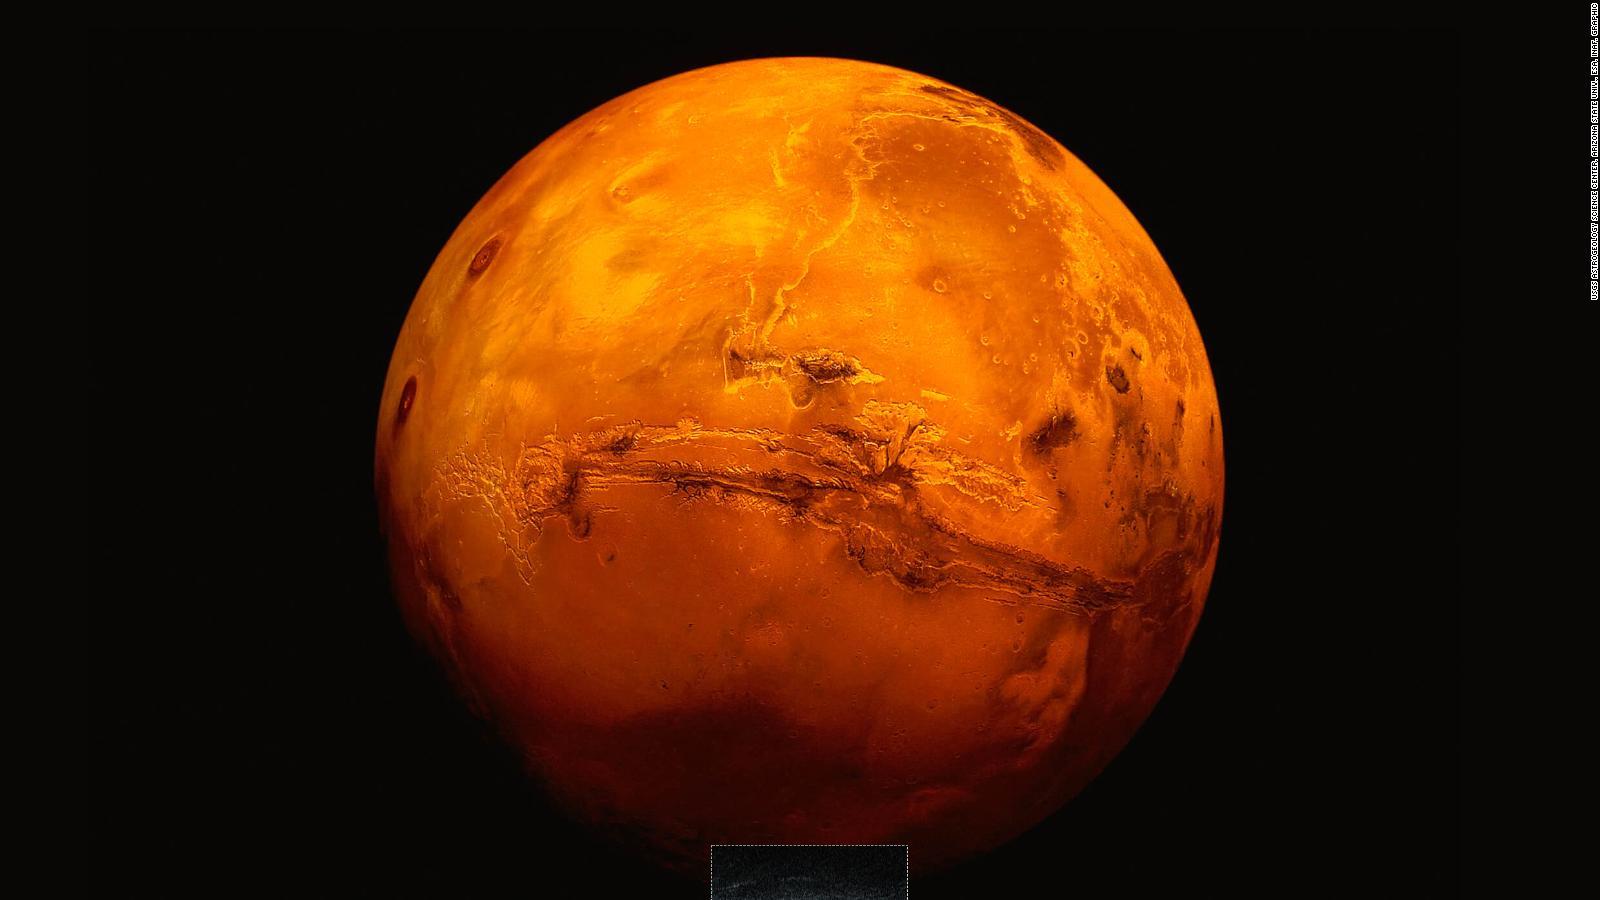 Meteorito-NASA-marte-posdata-digital-press